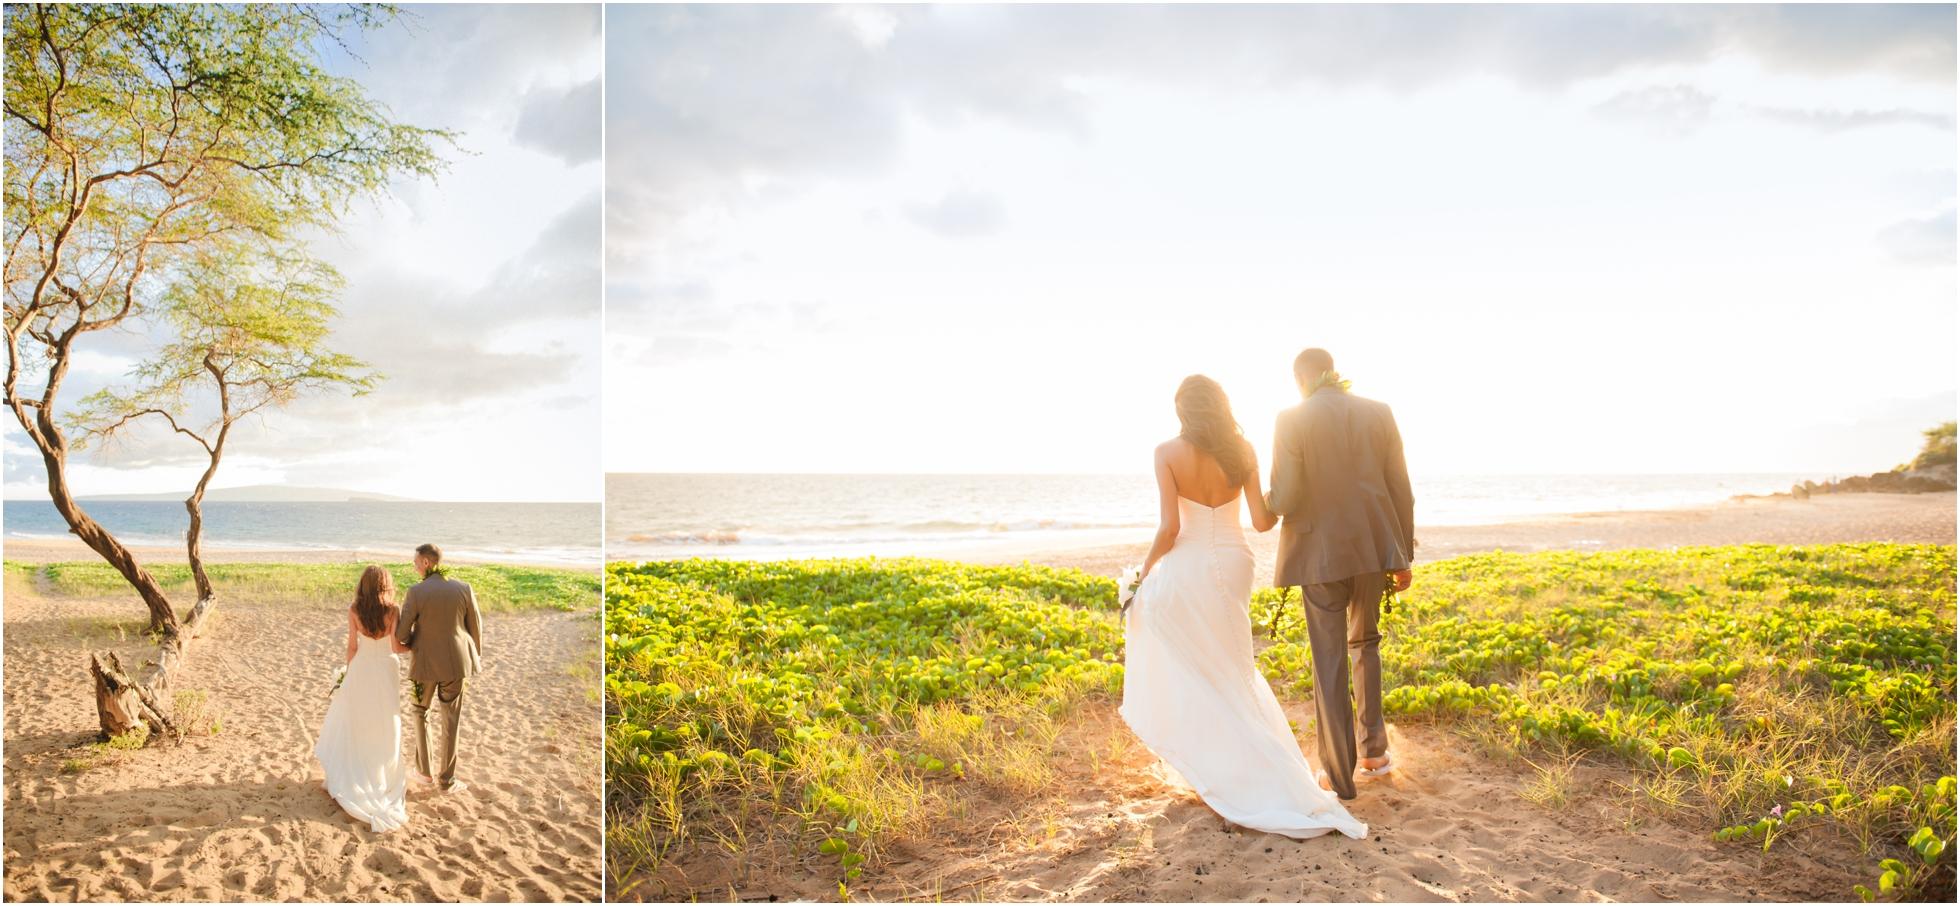 Maui Wedding Photographer_0039